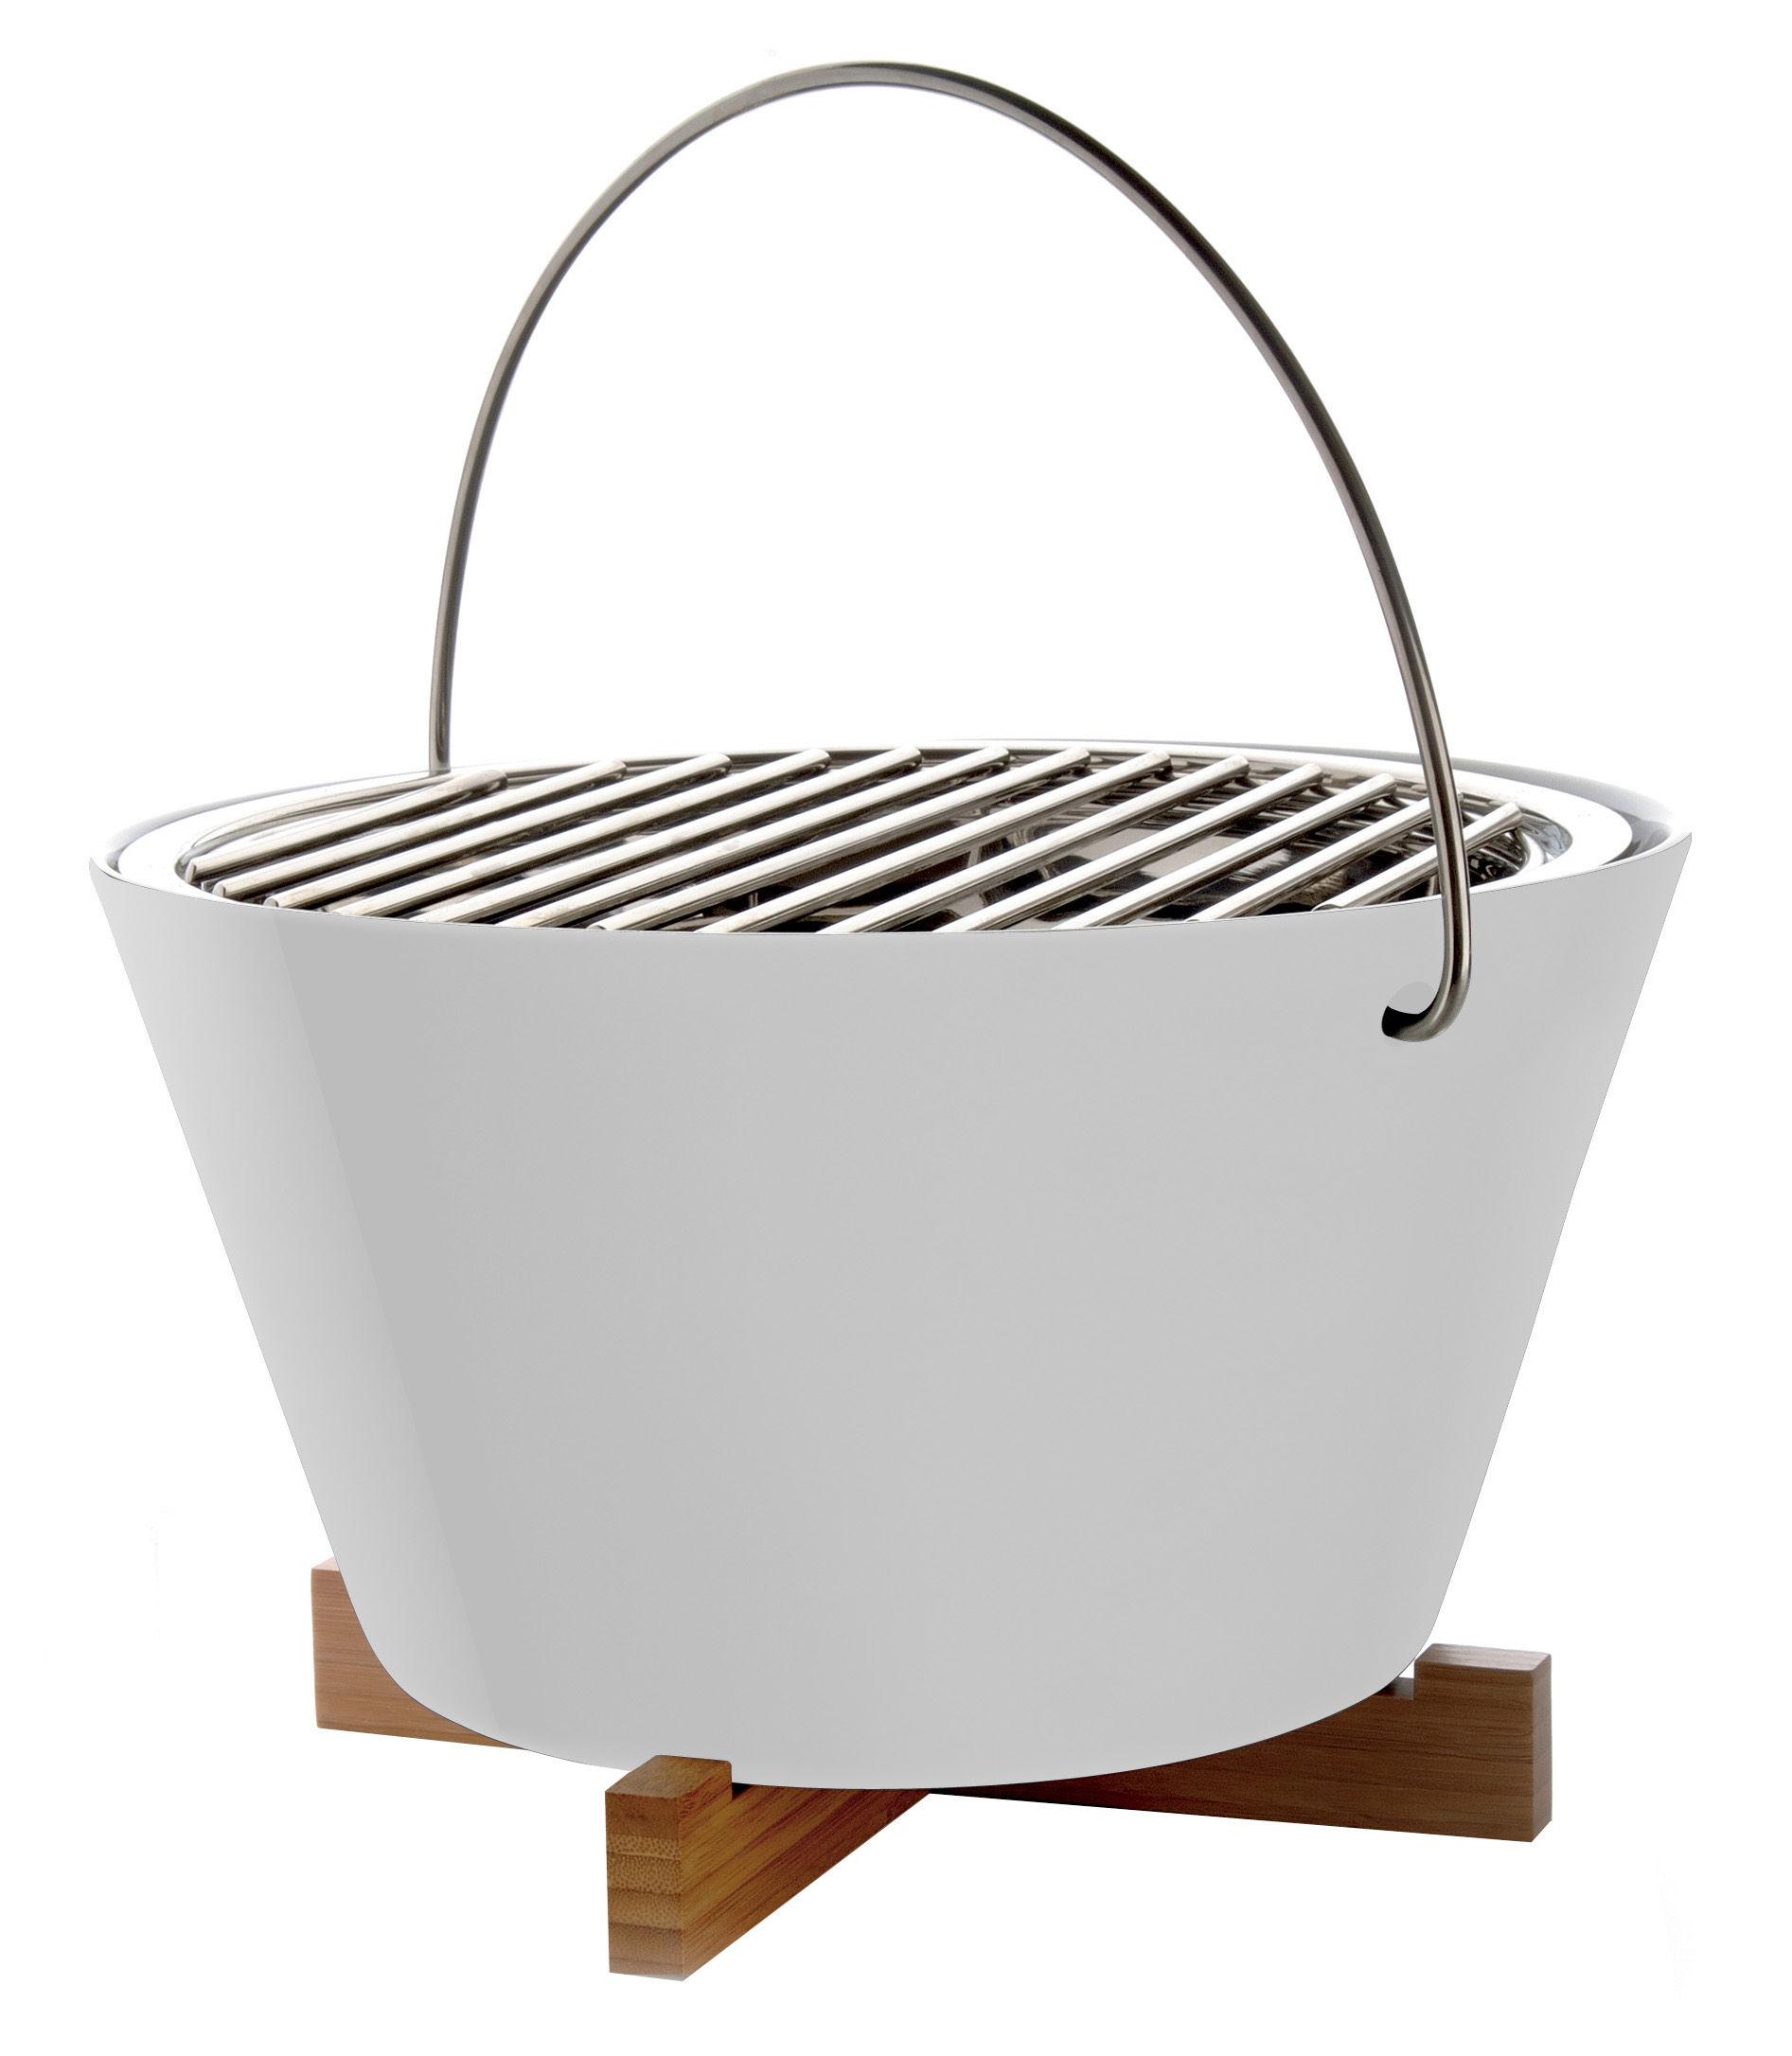 Barbecue charbon de table 30 x h 20 cm blanc eva - Barbecue charbon de table ...